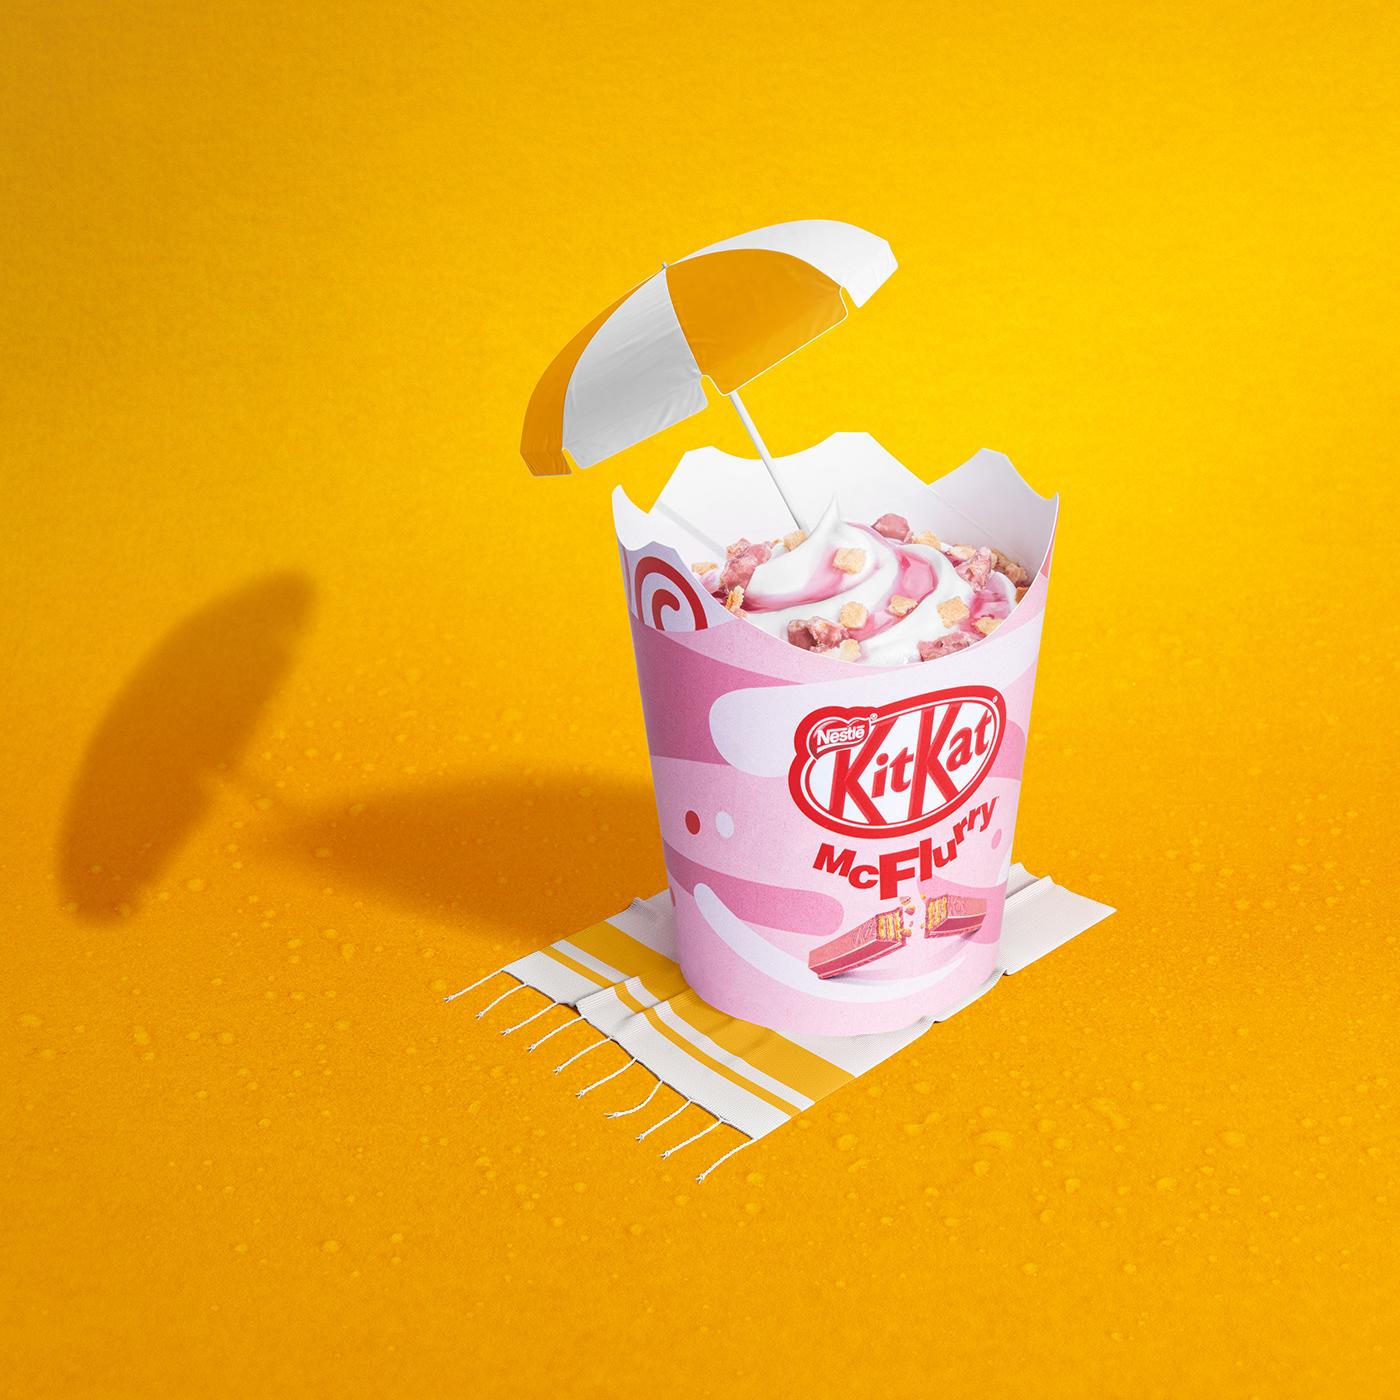 Food  food photography jakub dohnalek Leica McDonalds McFlurry pink profoto summer